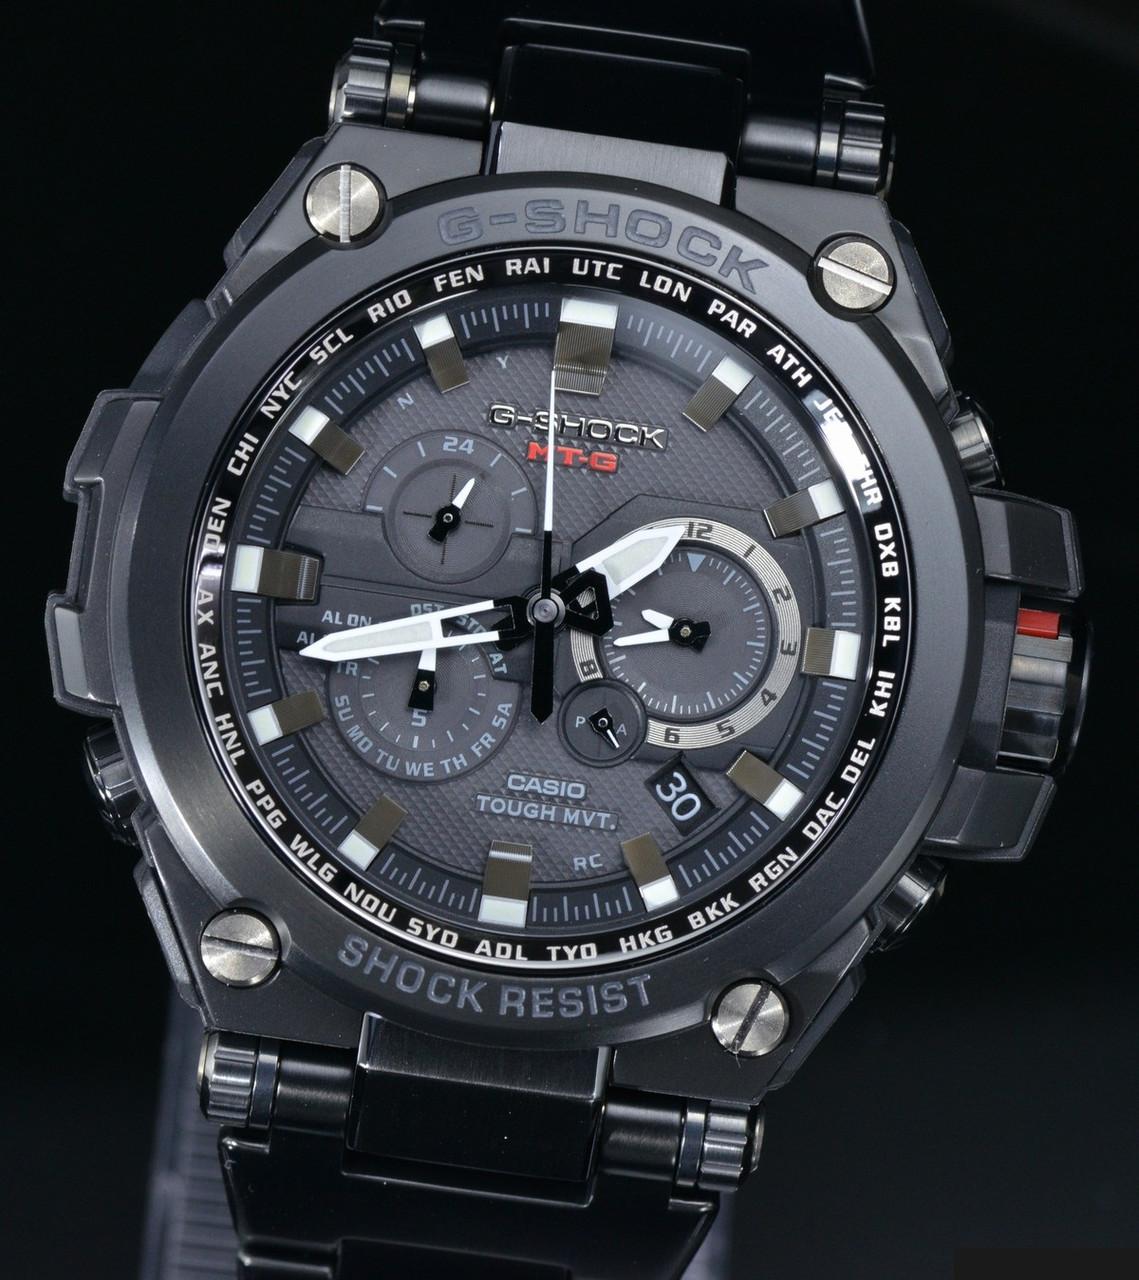 Часы Casio G-Shock MTG-S1000BD-1A MT-G Series В.